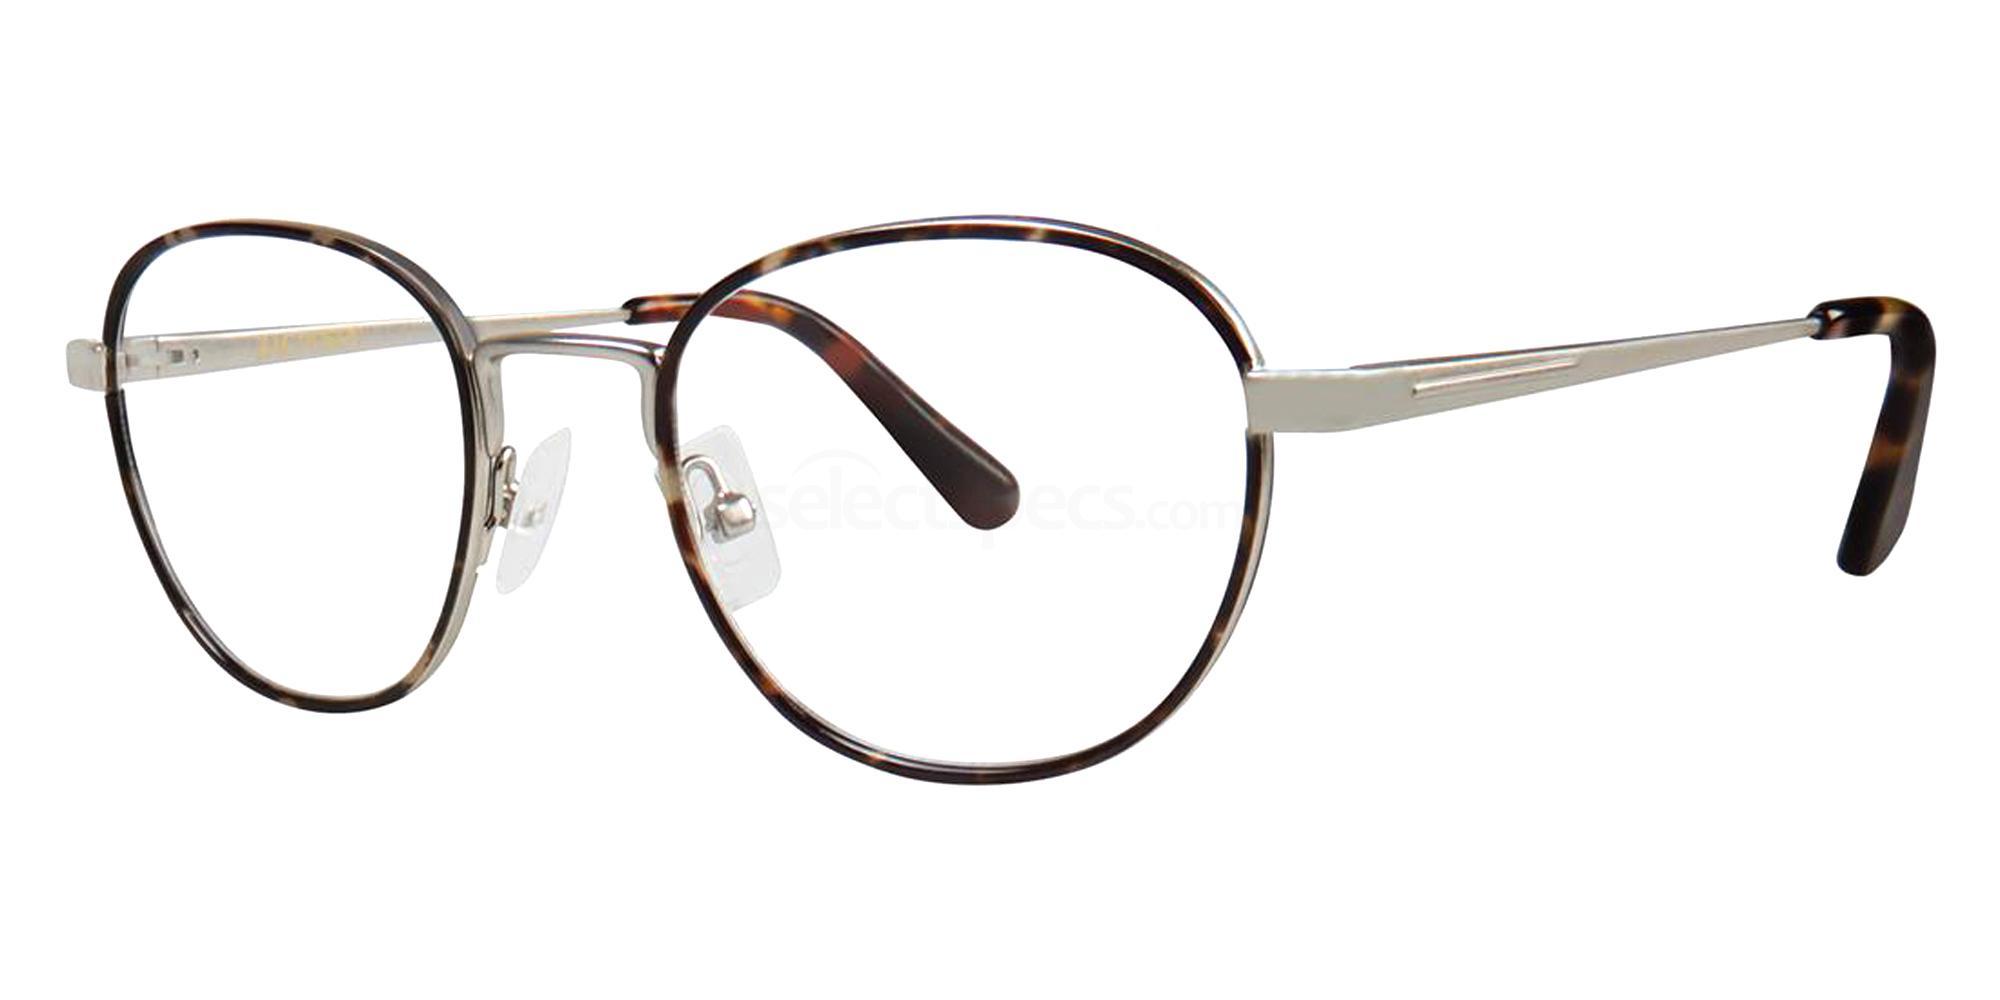 Havana Tortoise COBURN Glasses, Zac Posen